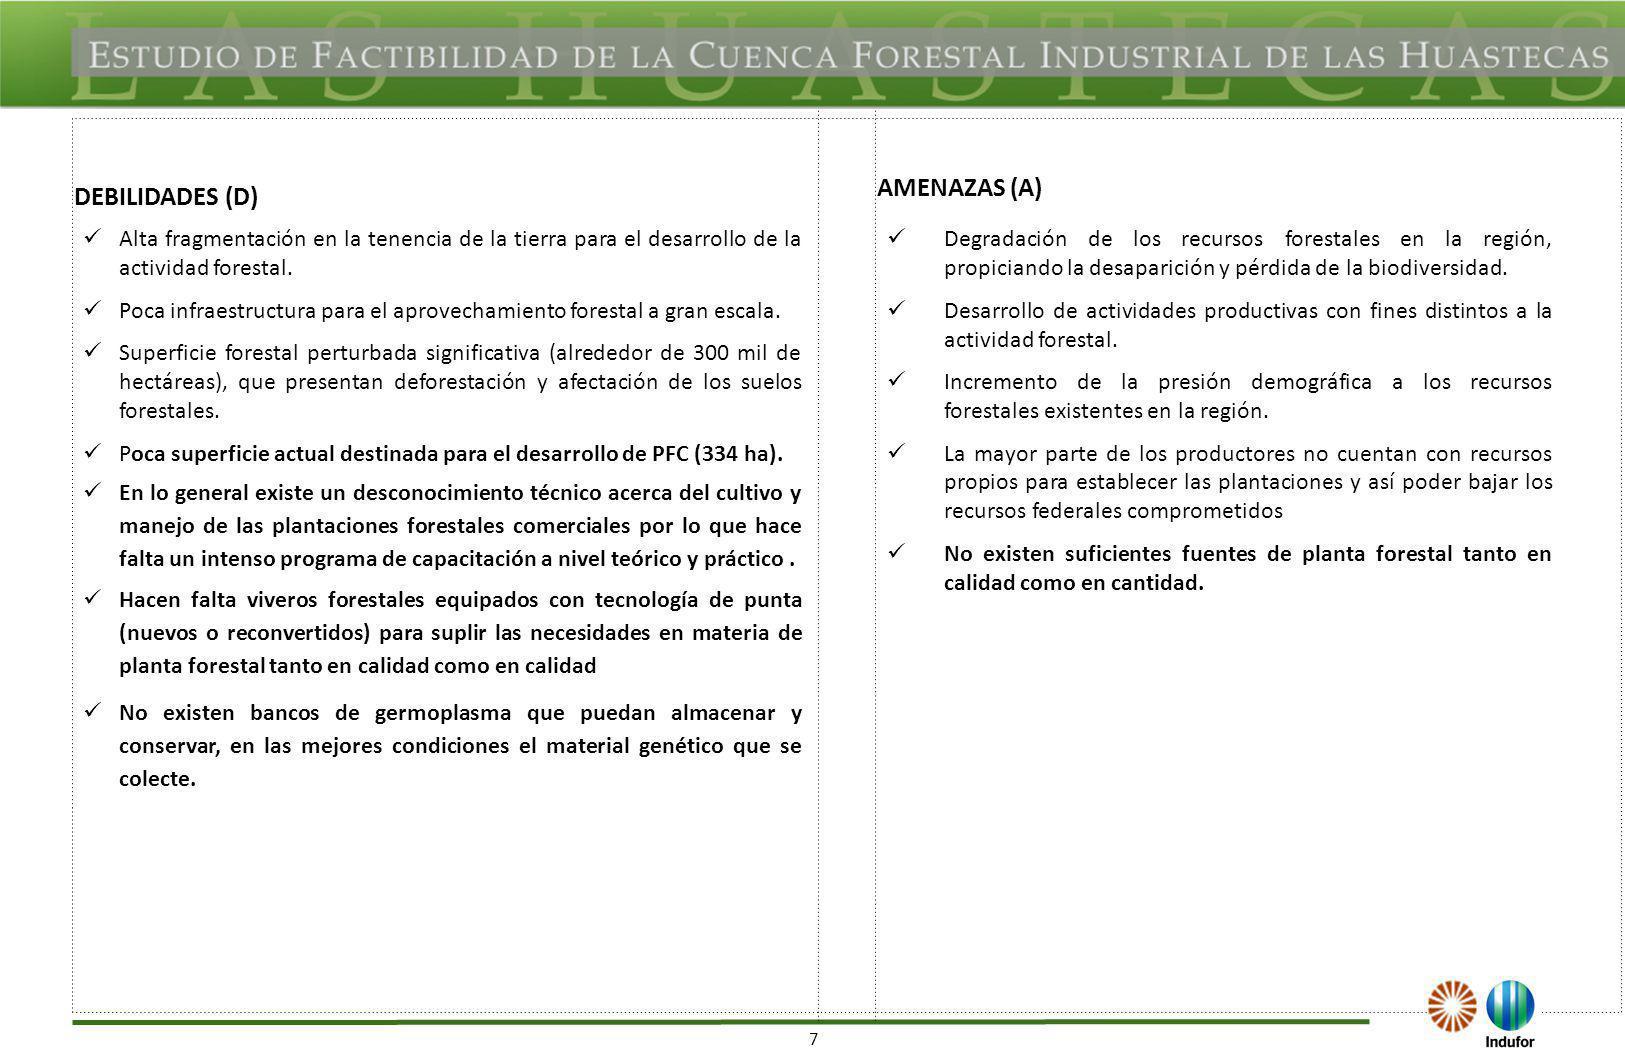 TAMAULIPAS OPORTUNIDADES (O) FORTALEZAS (F)